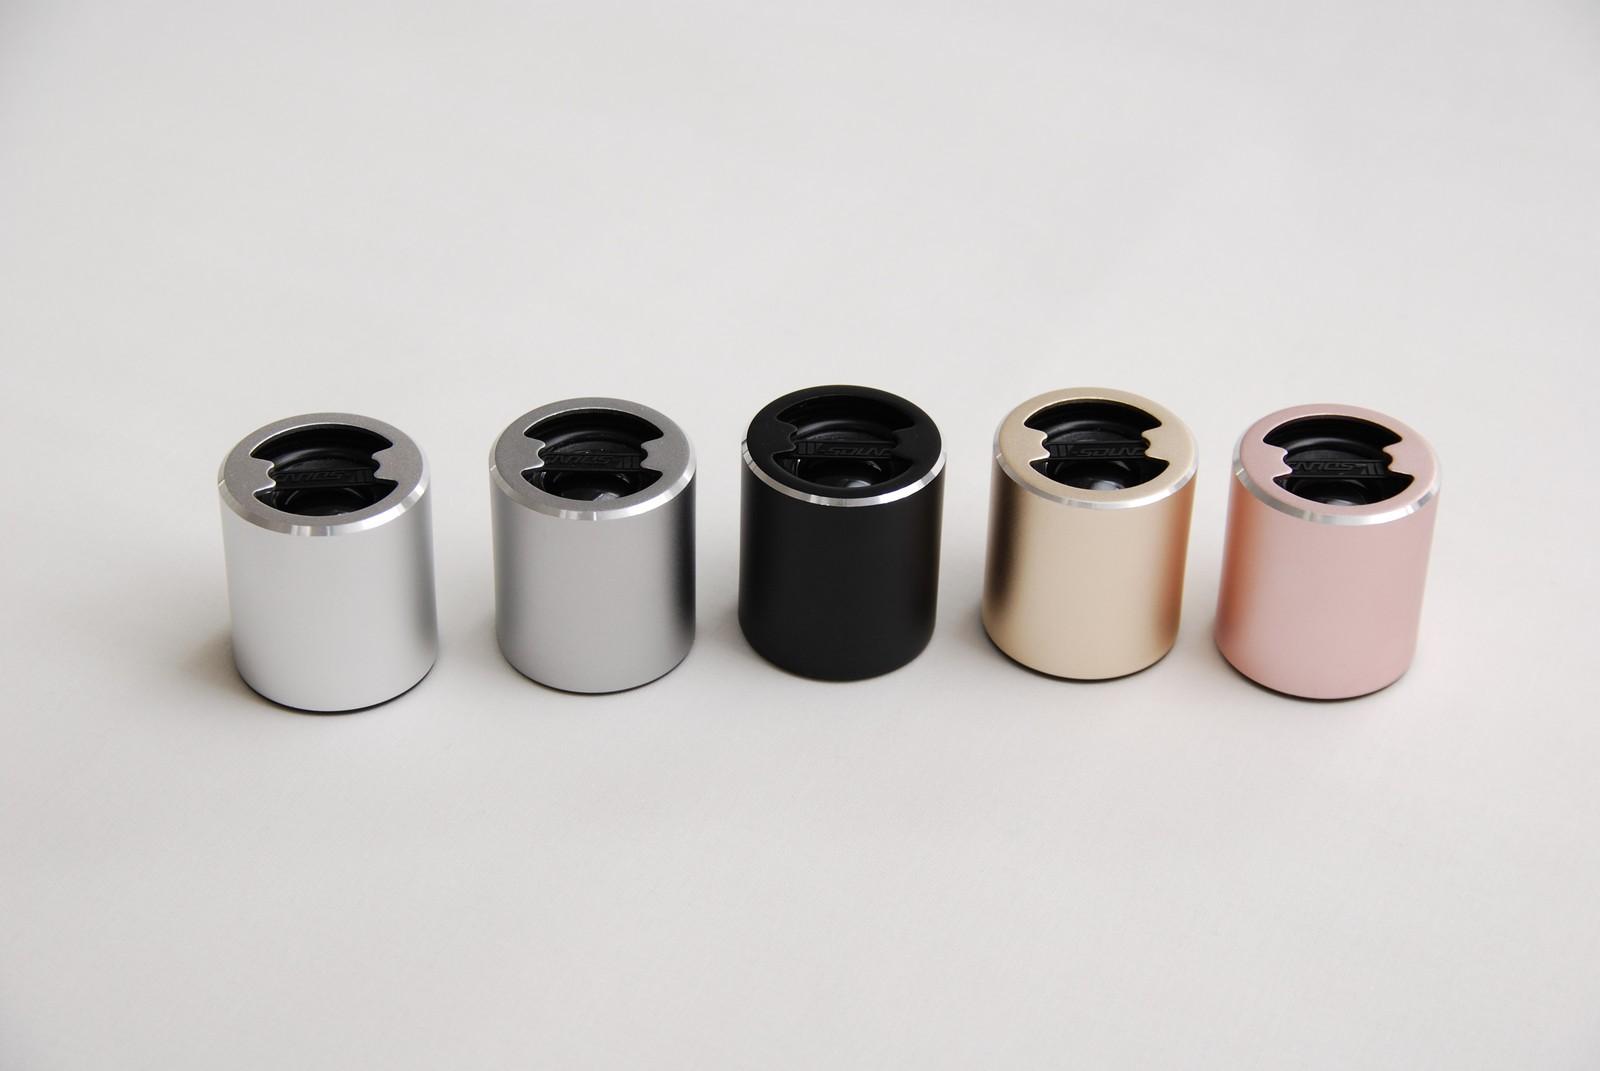 Metal Wireless Bluetooth Speakers